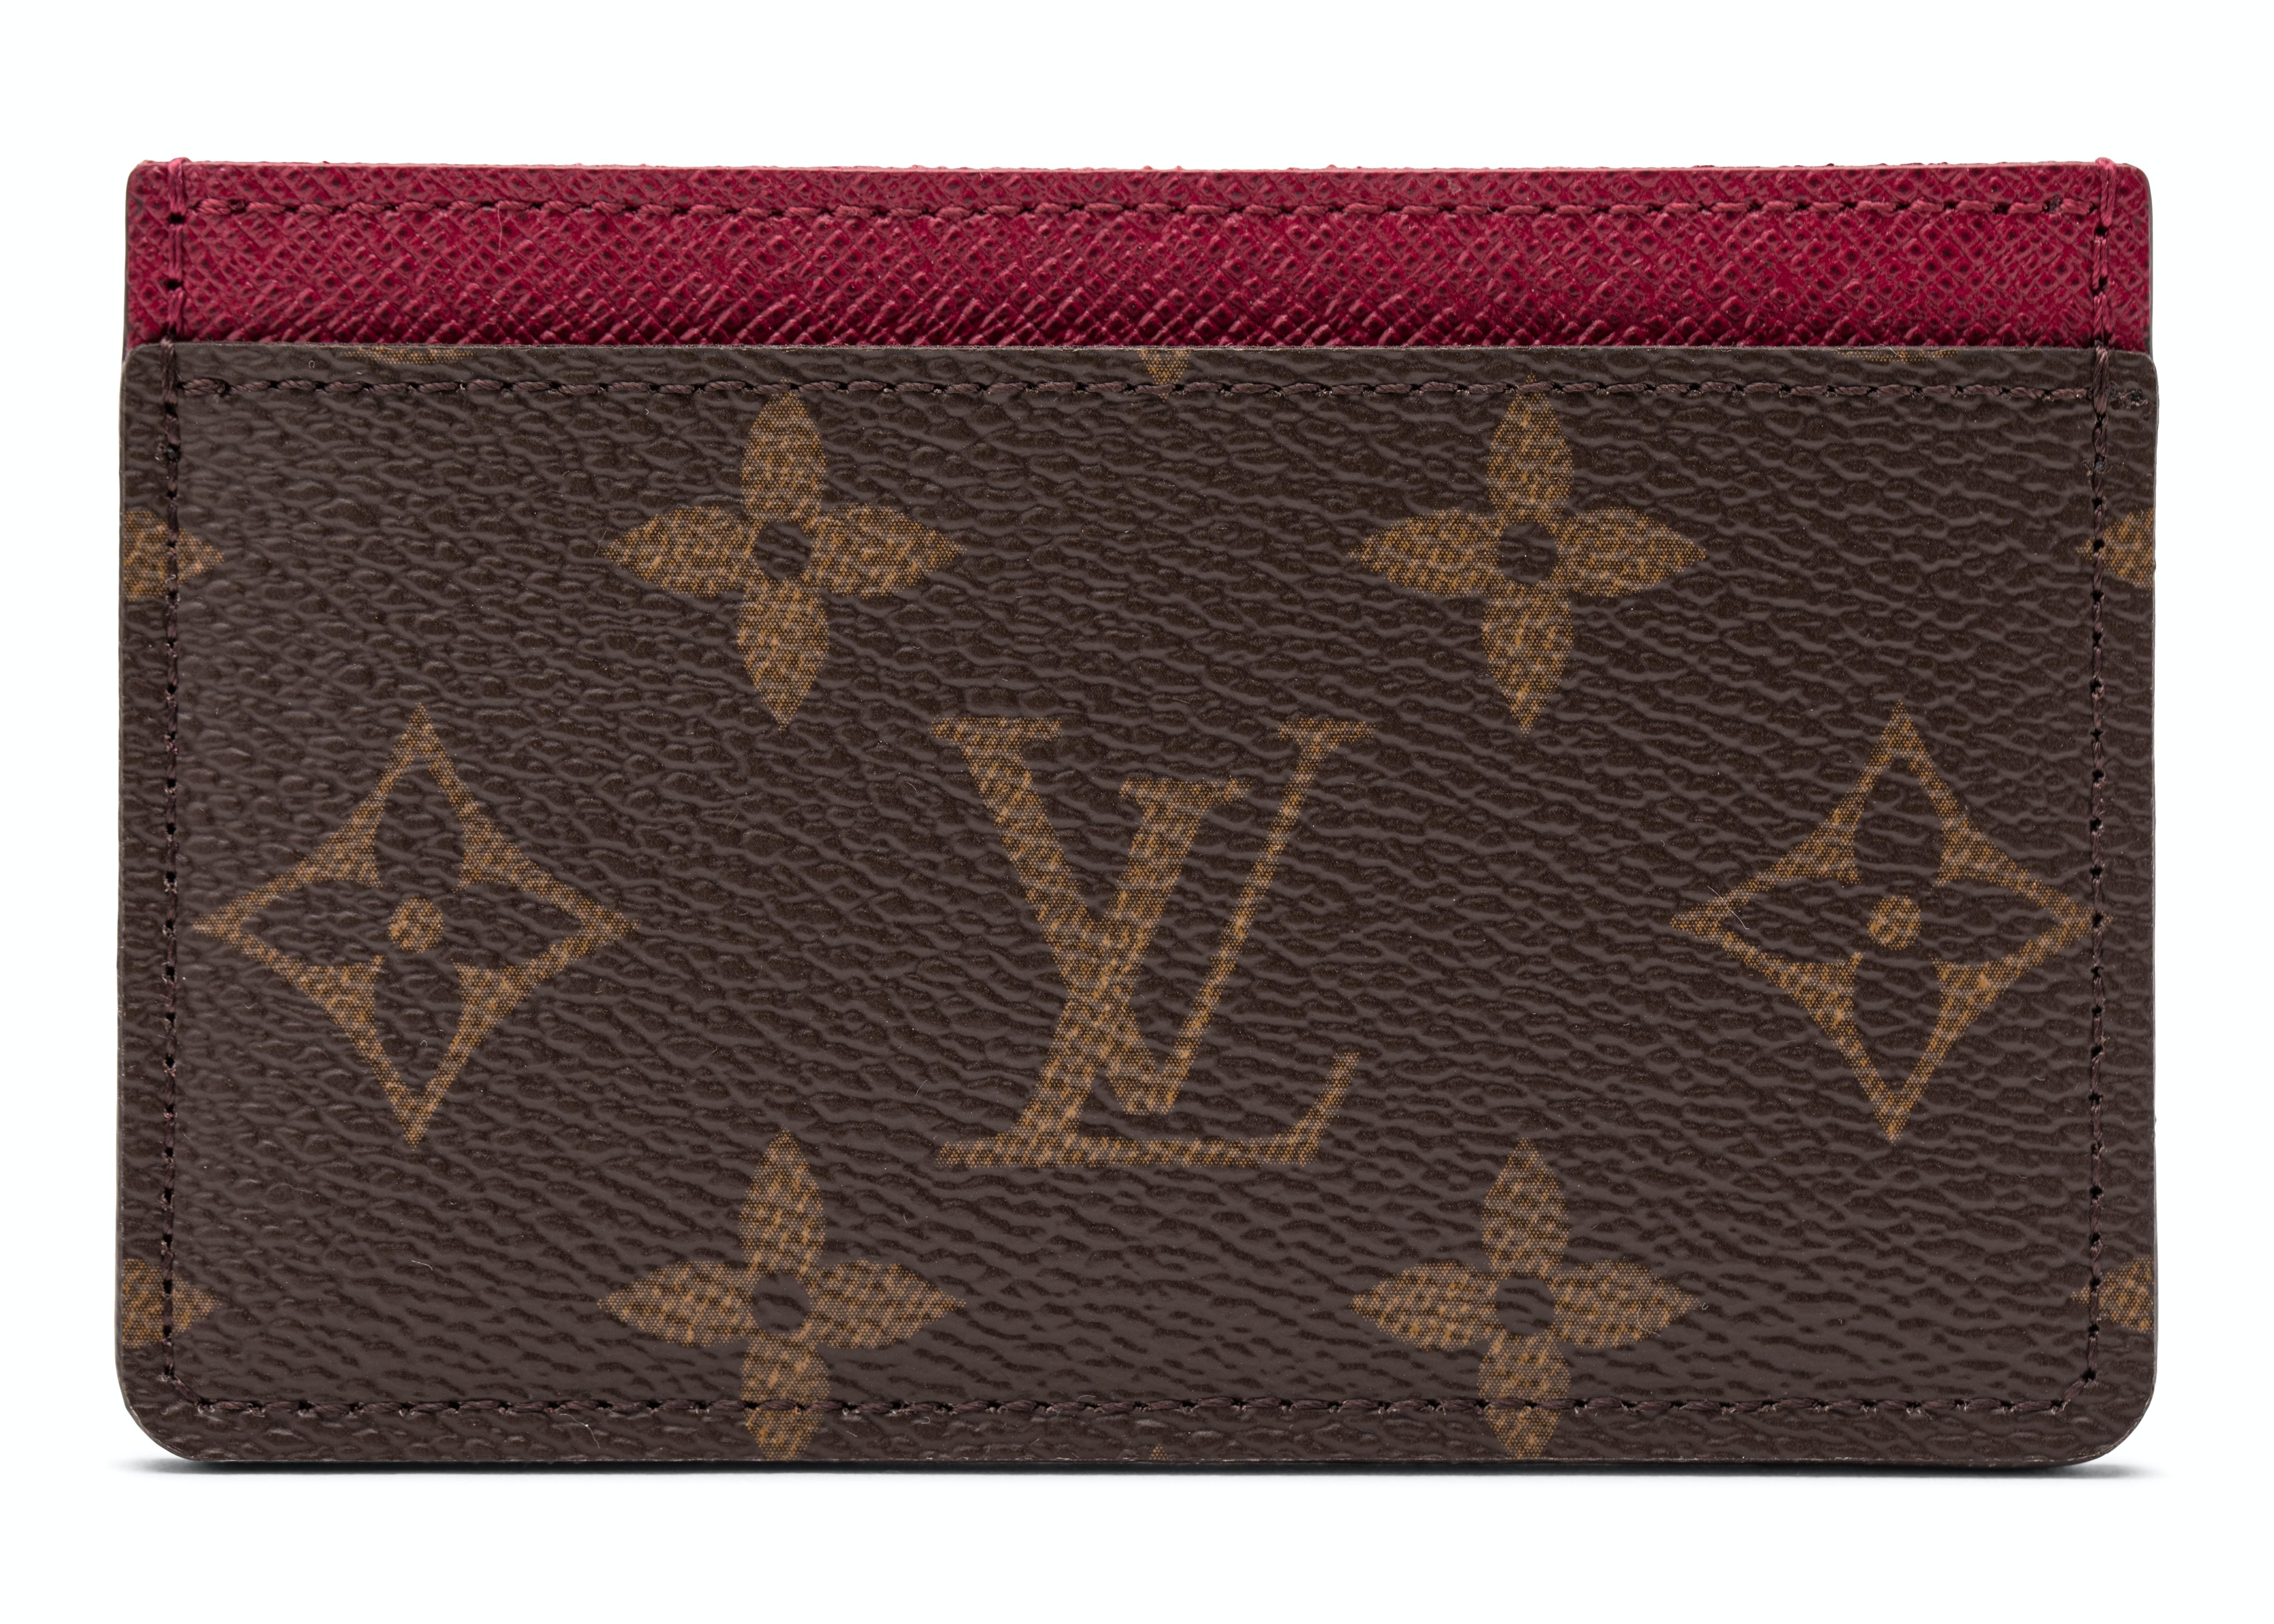 Louis Vuitton Card Holder Monogram Fuchsia